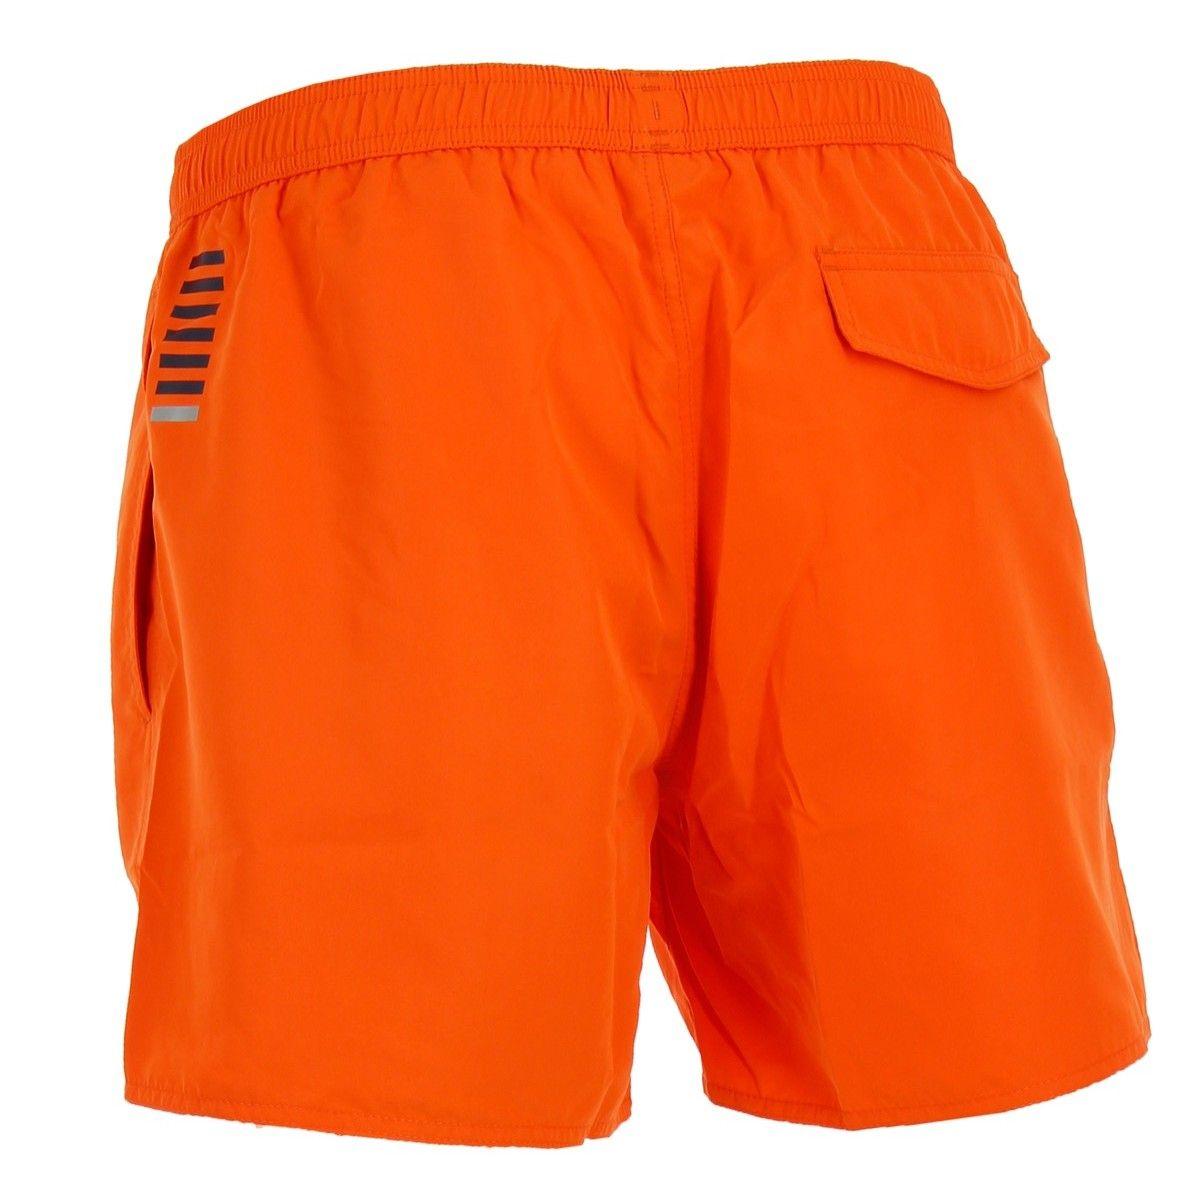 Shorts de bain  Emporio armani 902000 6P730 ORANGE 7962